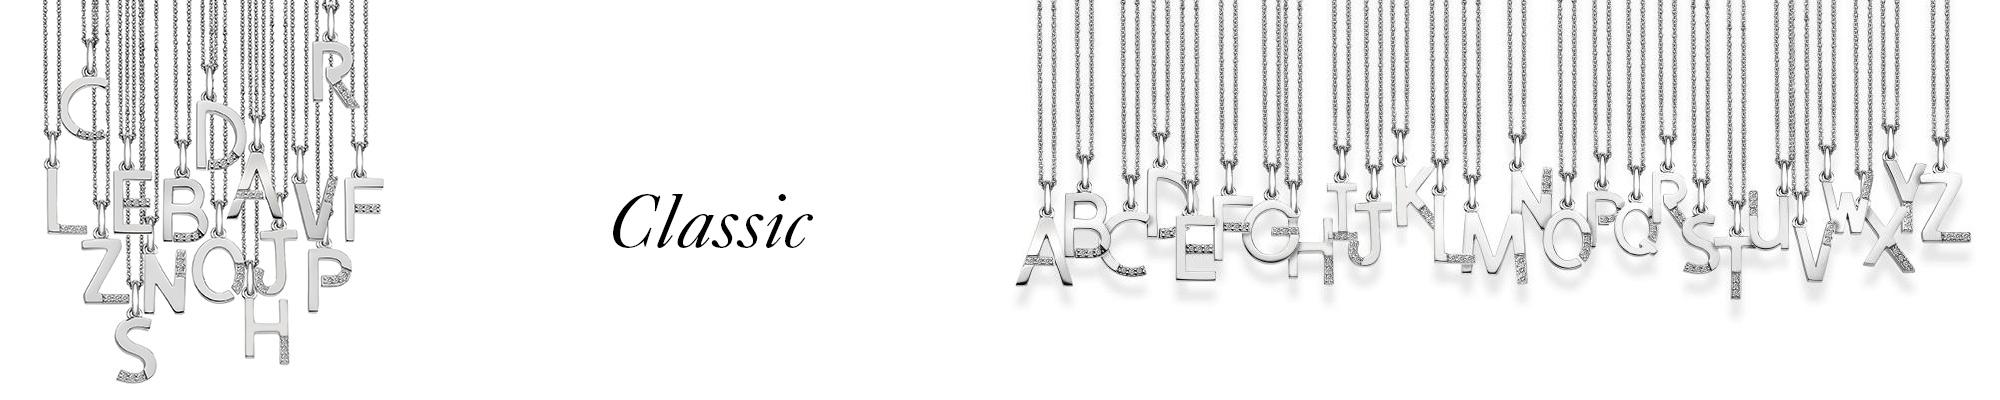 kolekce Classic - písmena - abeceda